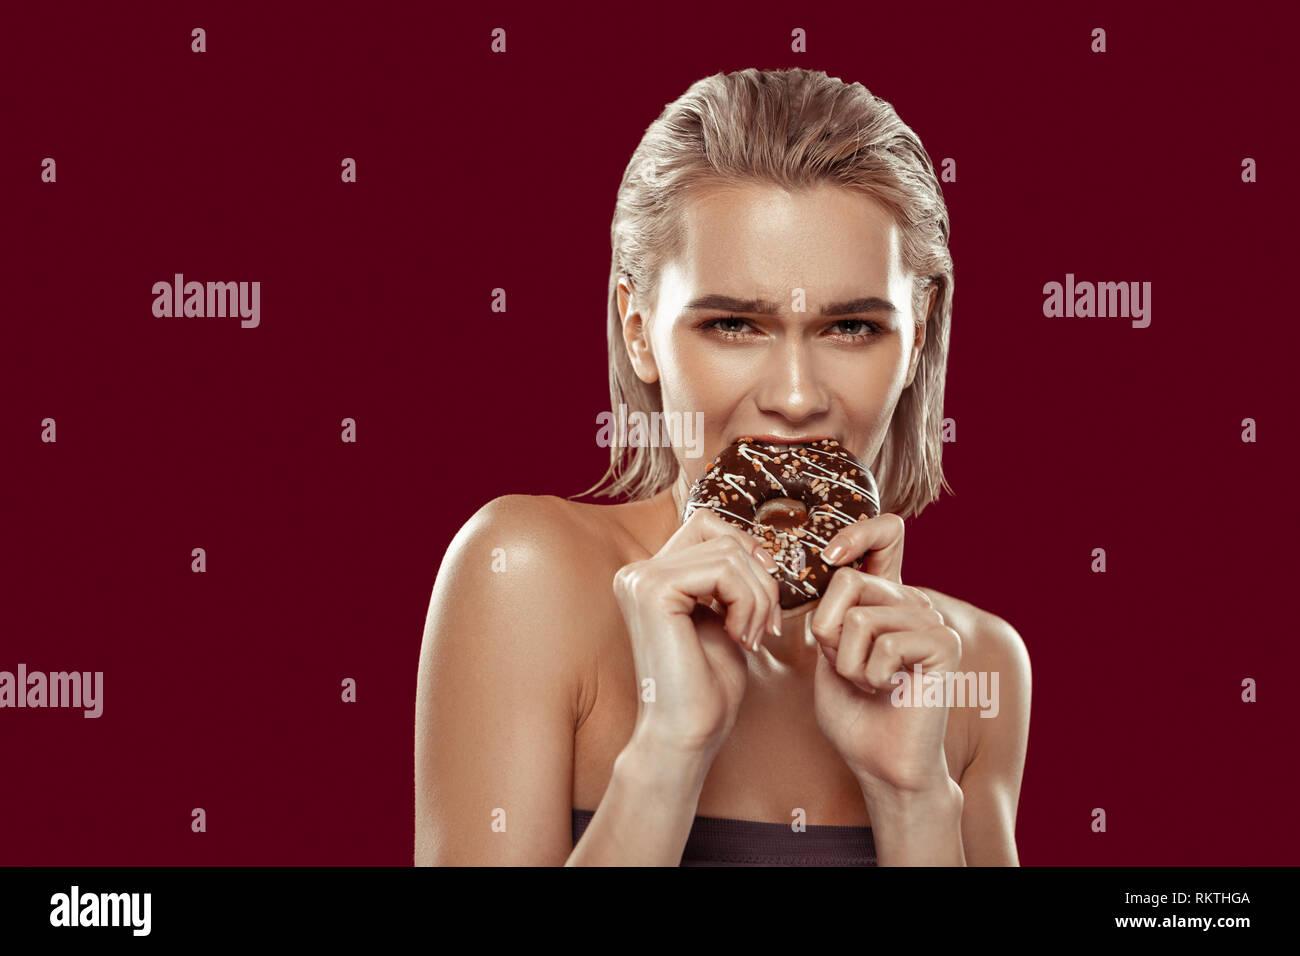 Dark-eyed woman having no wish to eat sweet unhealthy doughnut - Stock Image